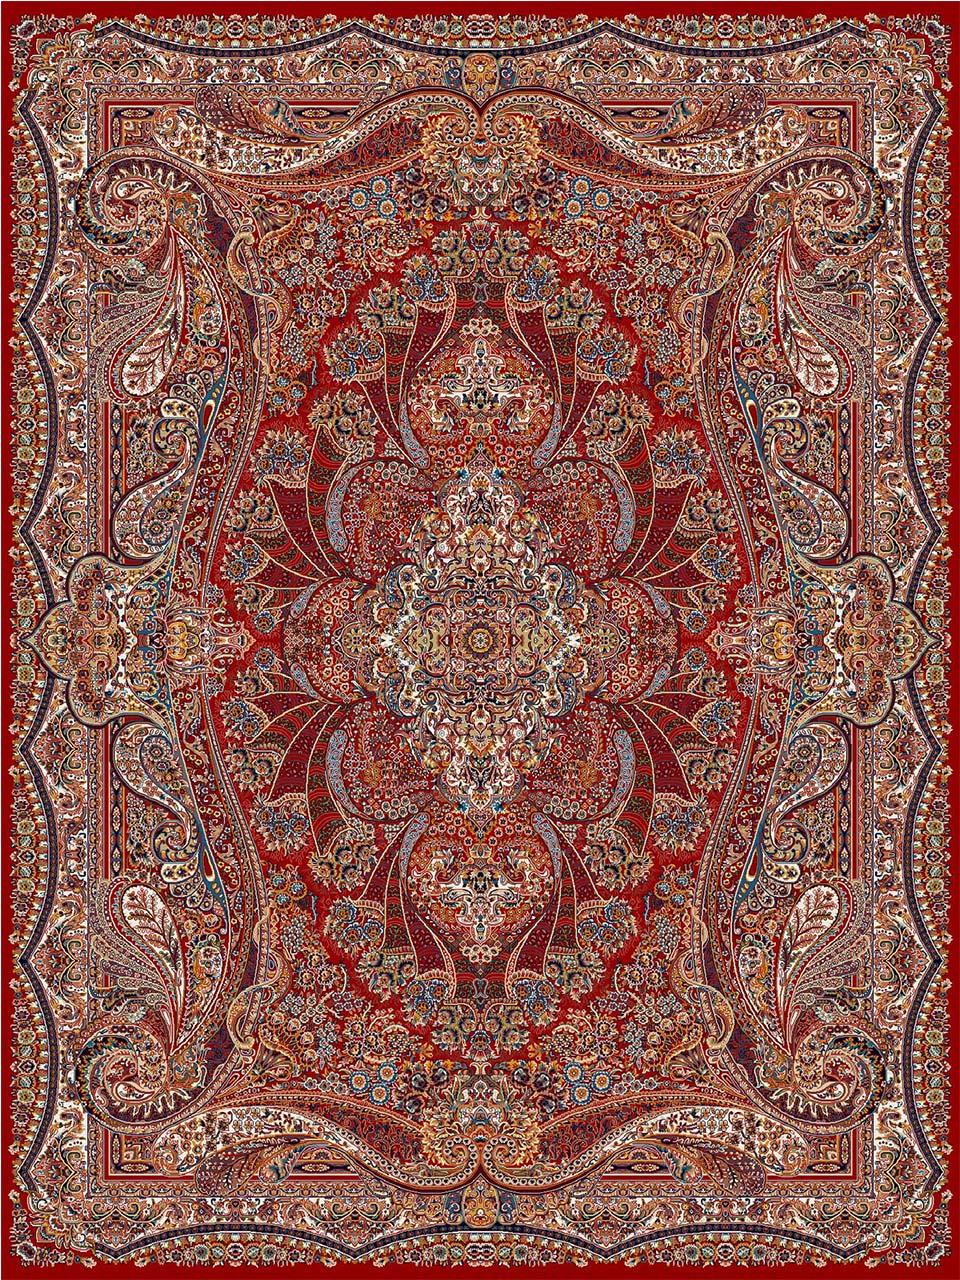 فرش (18123) اکریلیک - 8 رنگ - 500 شانه - لاكي - تراکم 1000